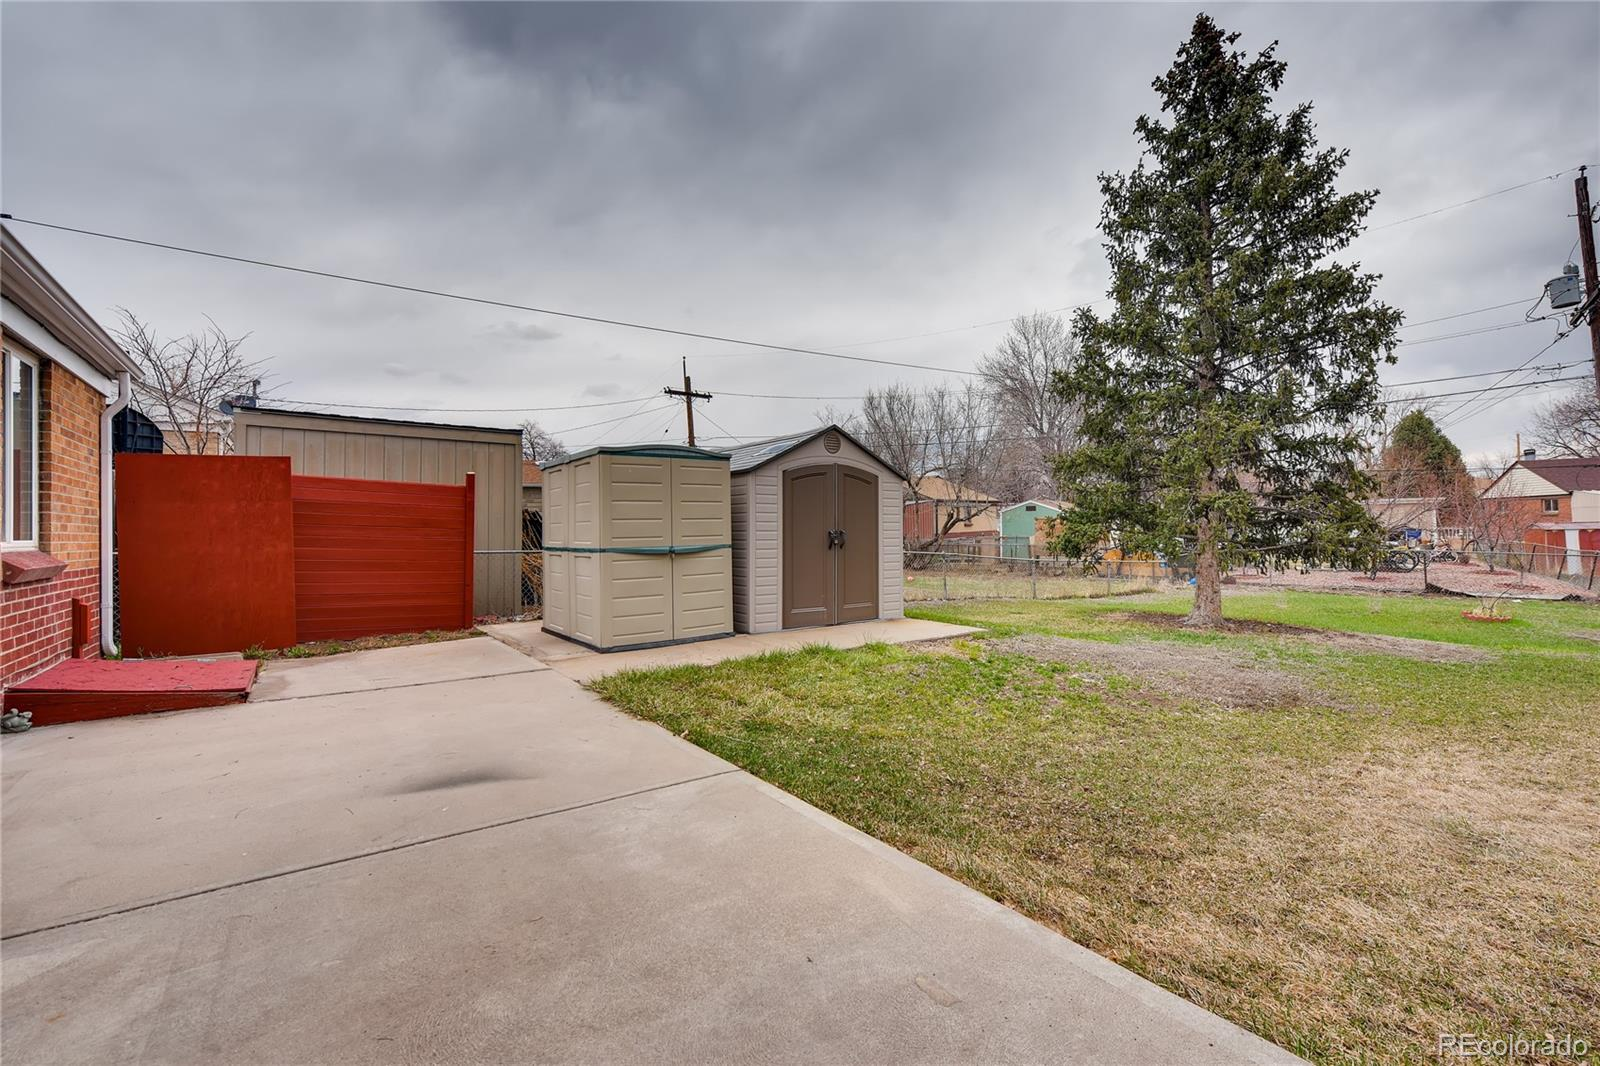 MLS# 5843899 - 15 - 1382 S Canosa Court, Denver, CO 80219